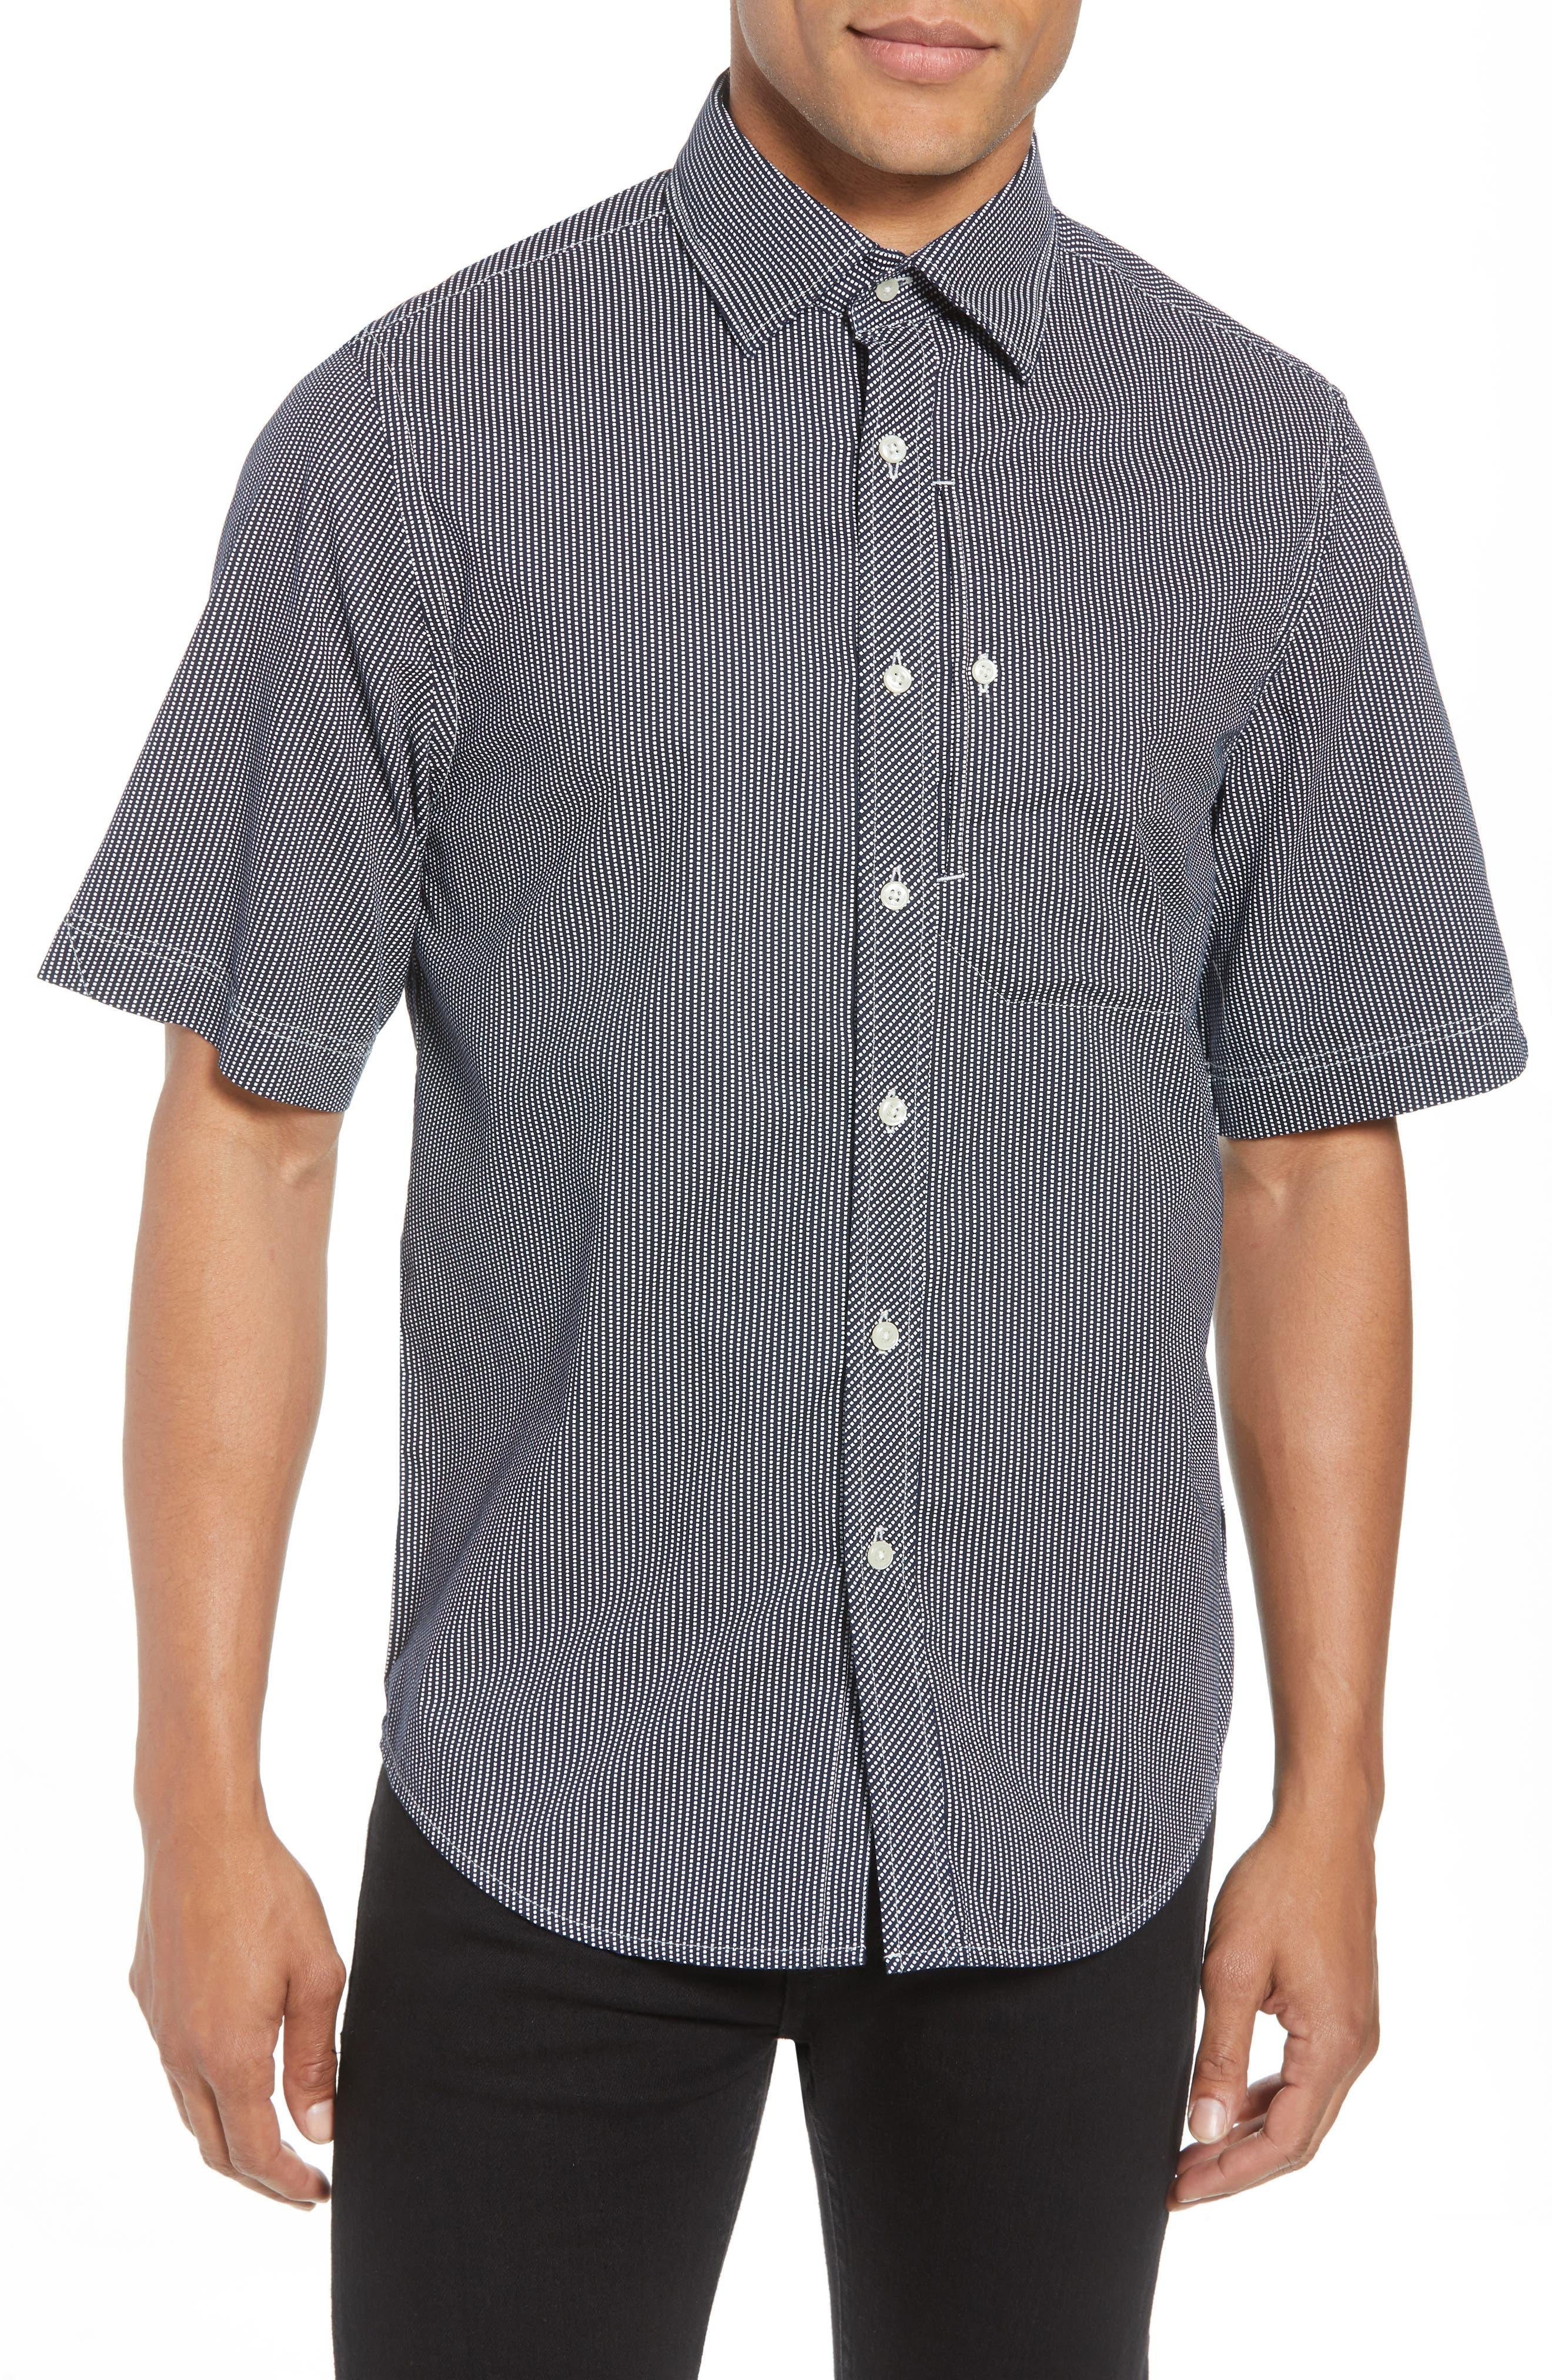 Bristum Straight Ref Shirt,                         Main,                         color, Sartho Blue/ Milk